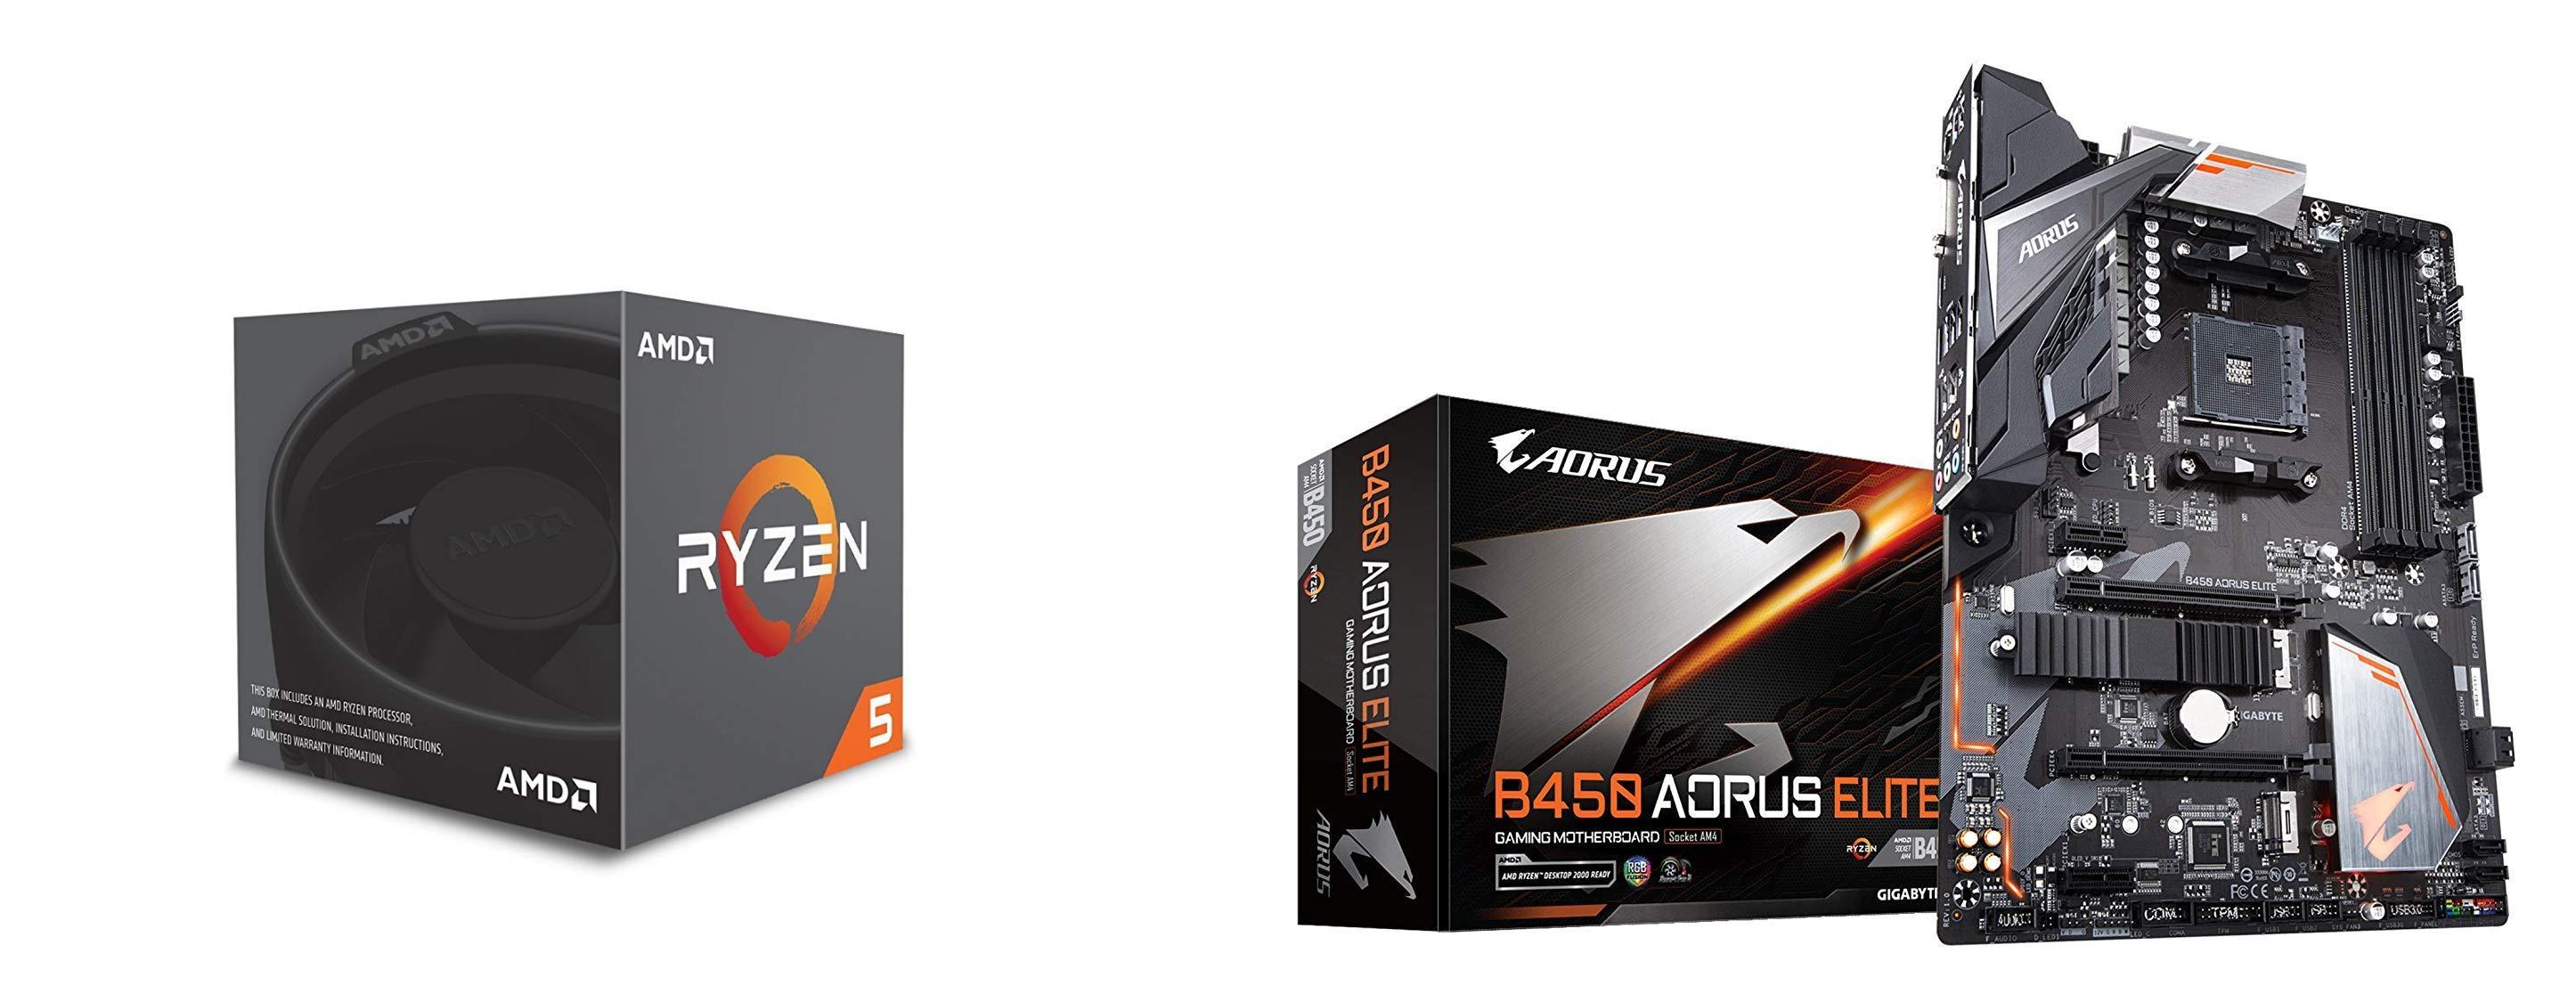 AMD Philippines: AMD price list - Processor, Desktop for sale | Lazada